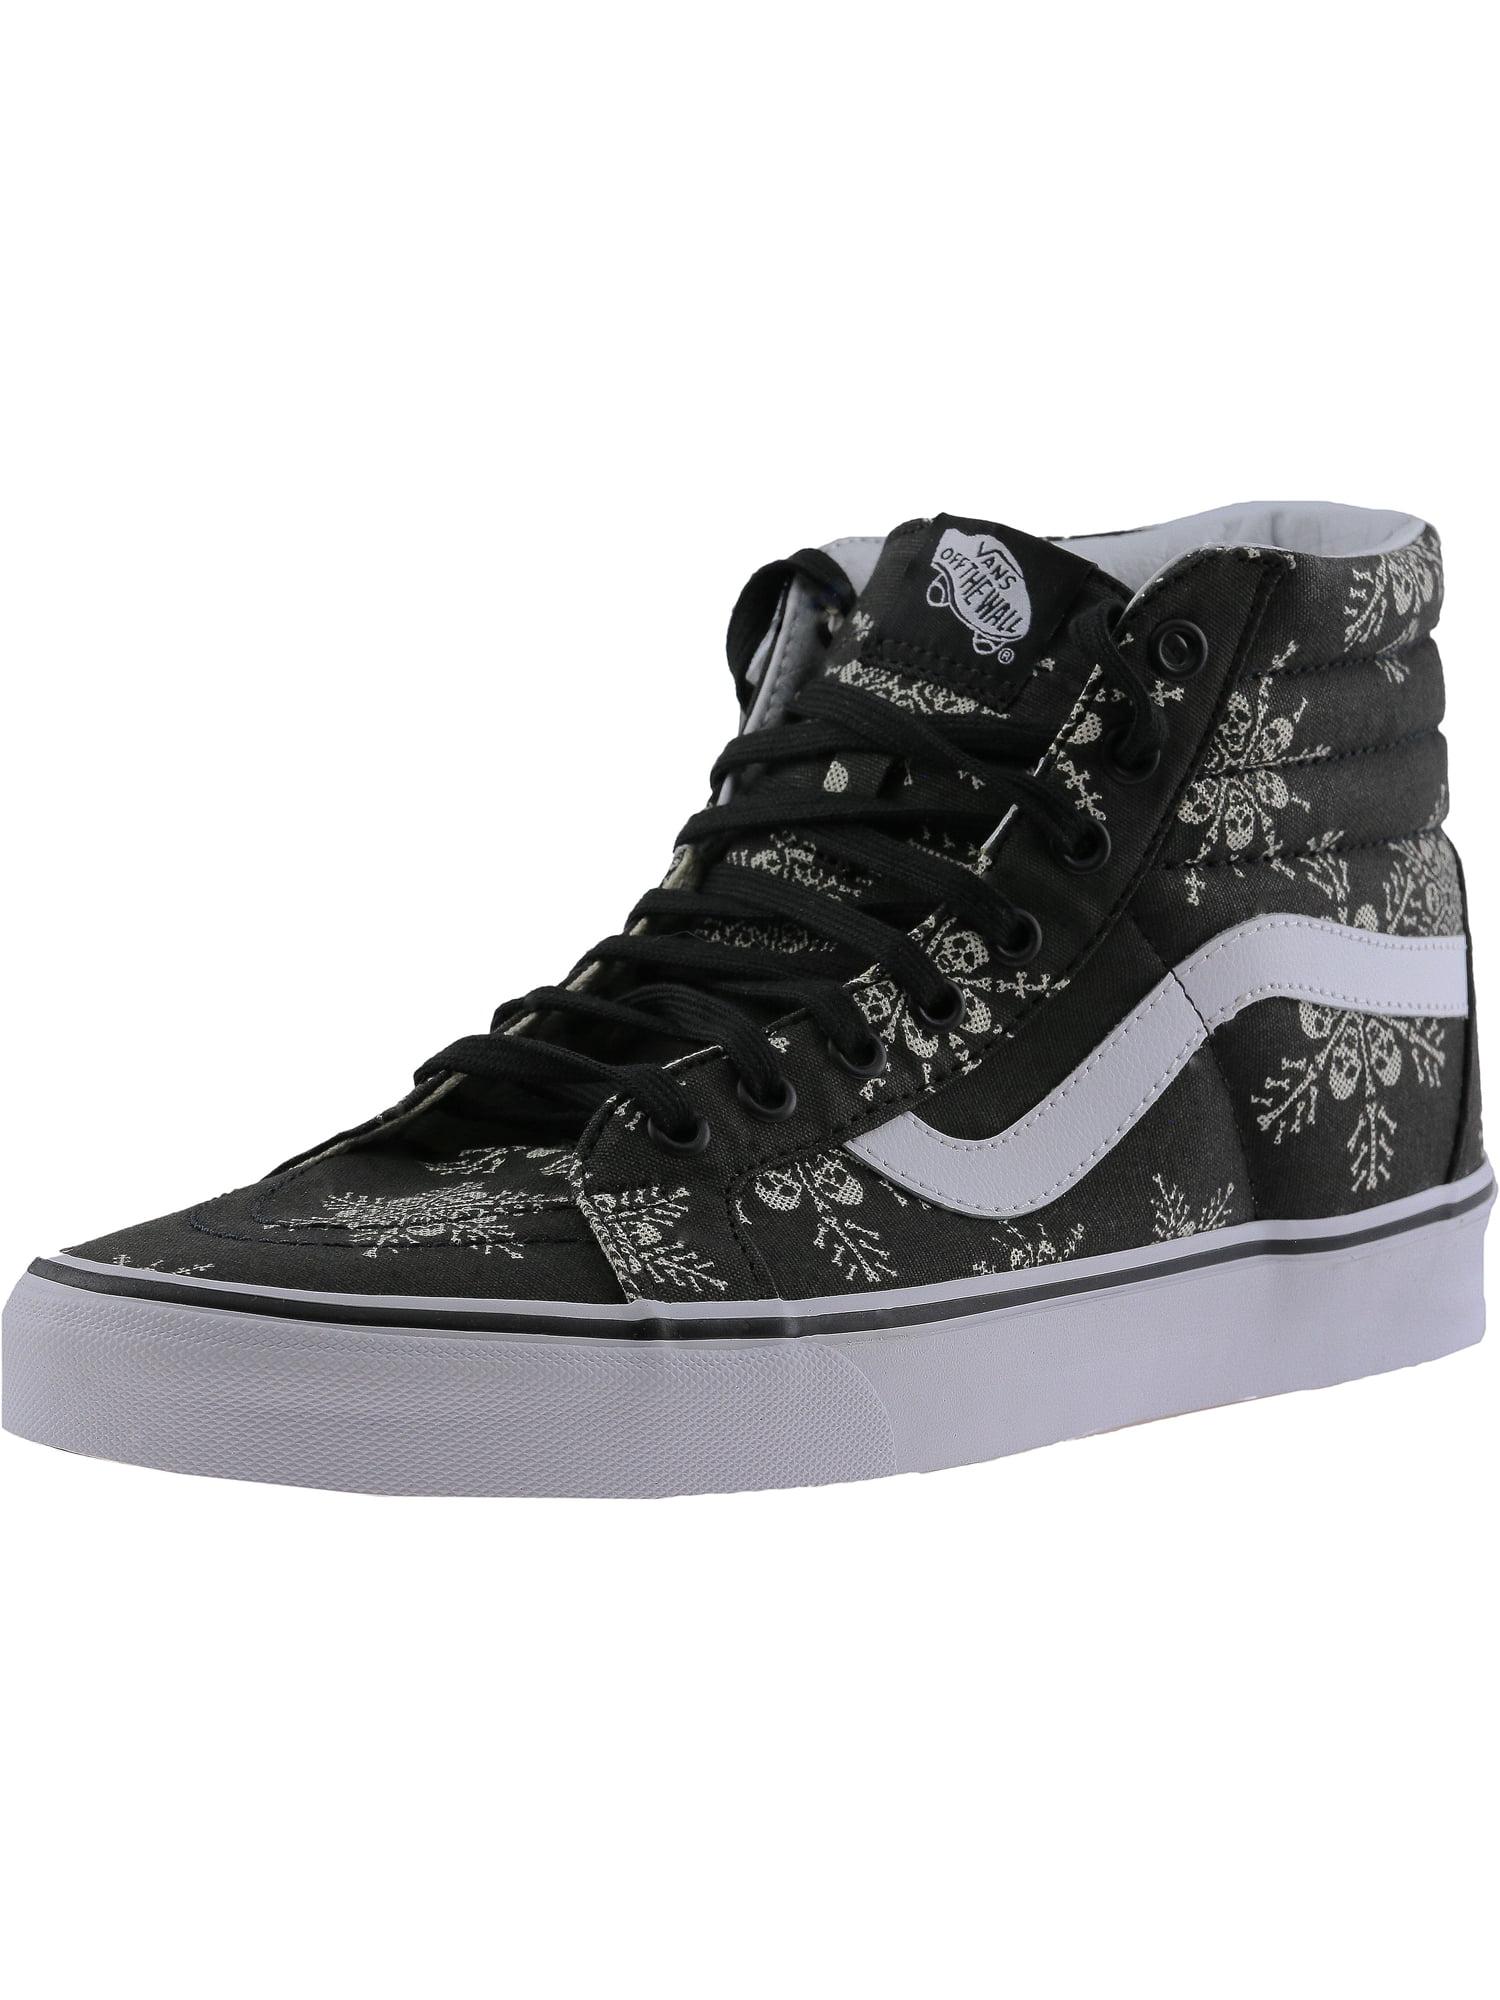 Vans Vans Sk8 Hi Reissue Van Doren Skull Snowflake Black Ankle High Fabric Fashion Sneaker 12M 10.5M